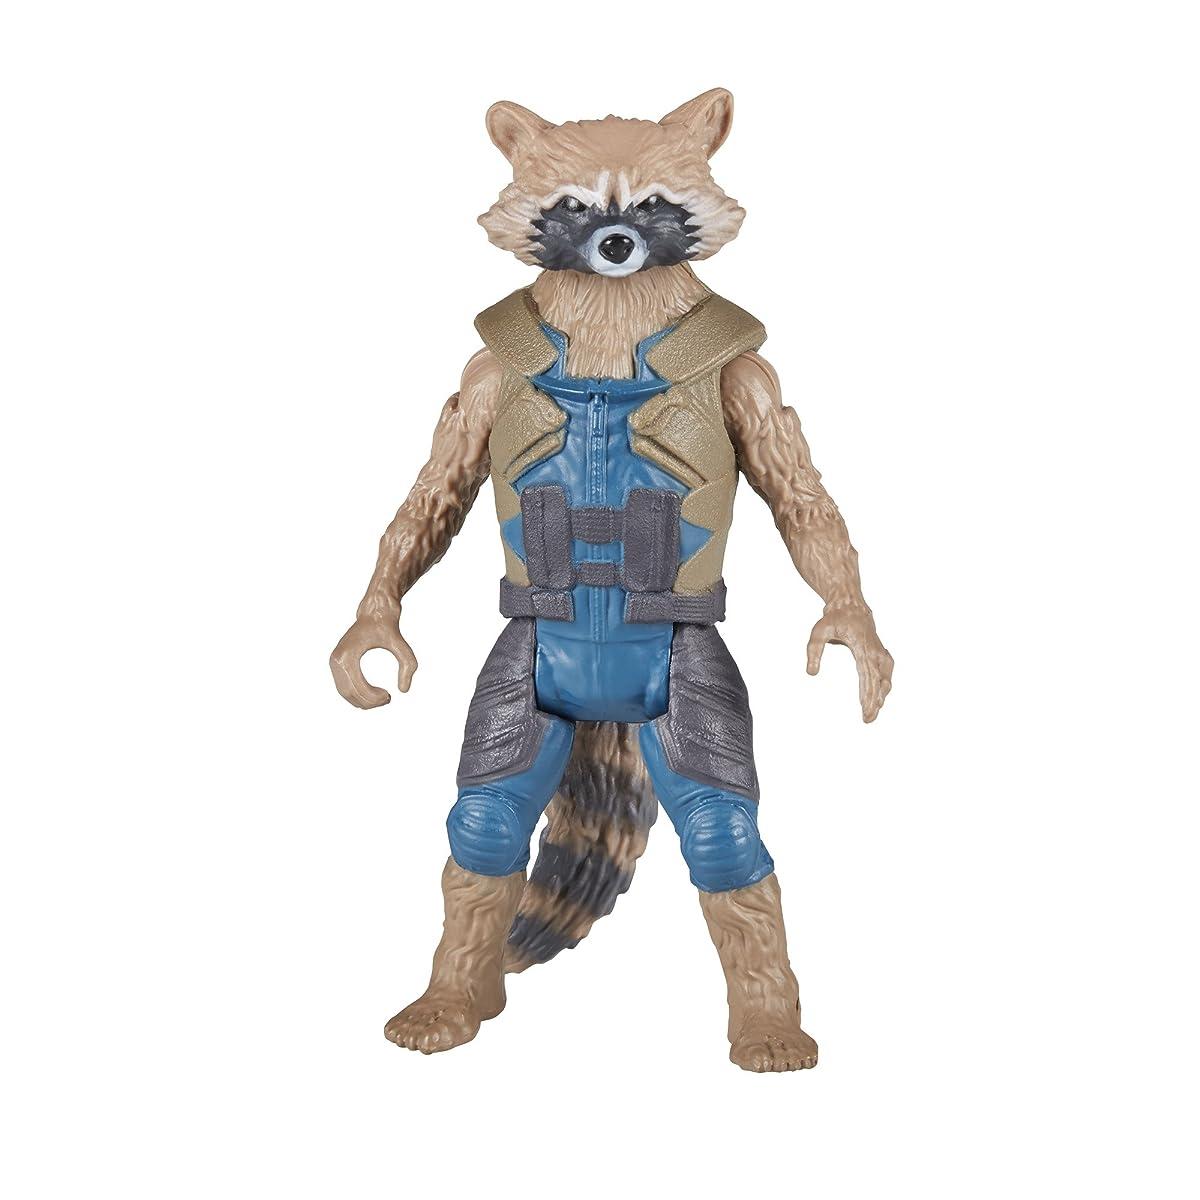 Marvel Avengers: Infinity War Rocket Raccoon & Groot with Infinity Stone